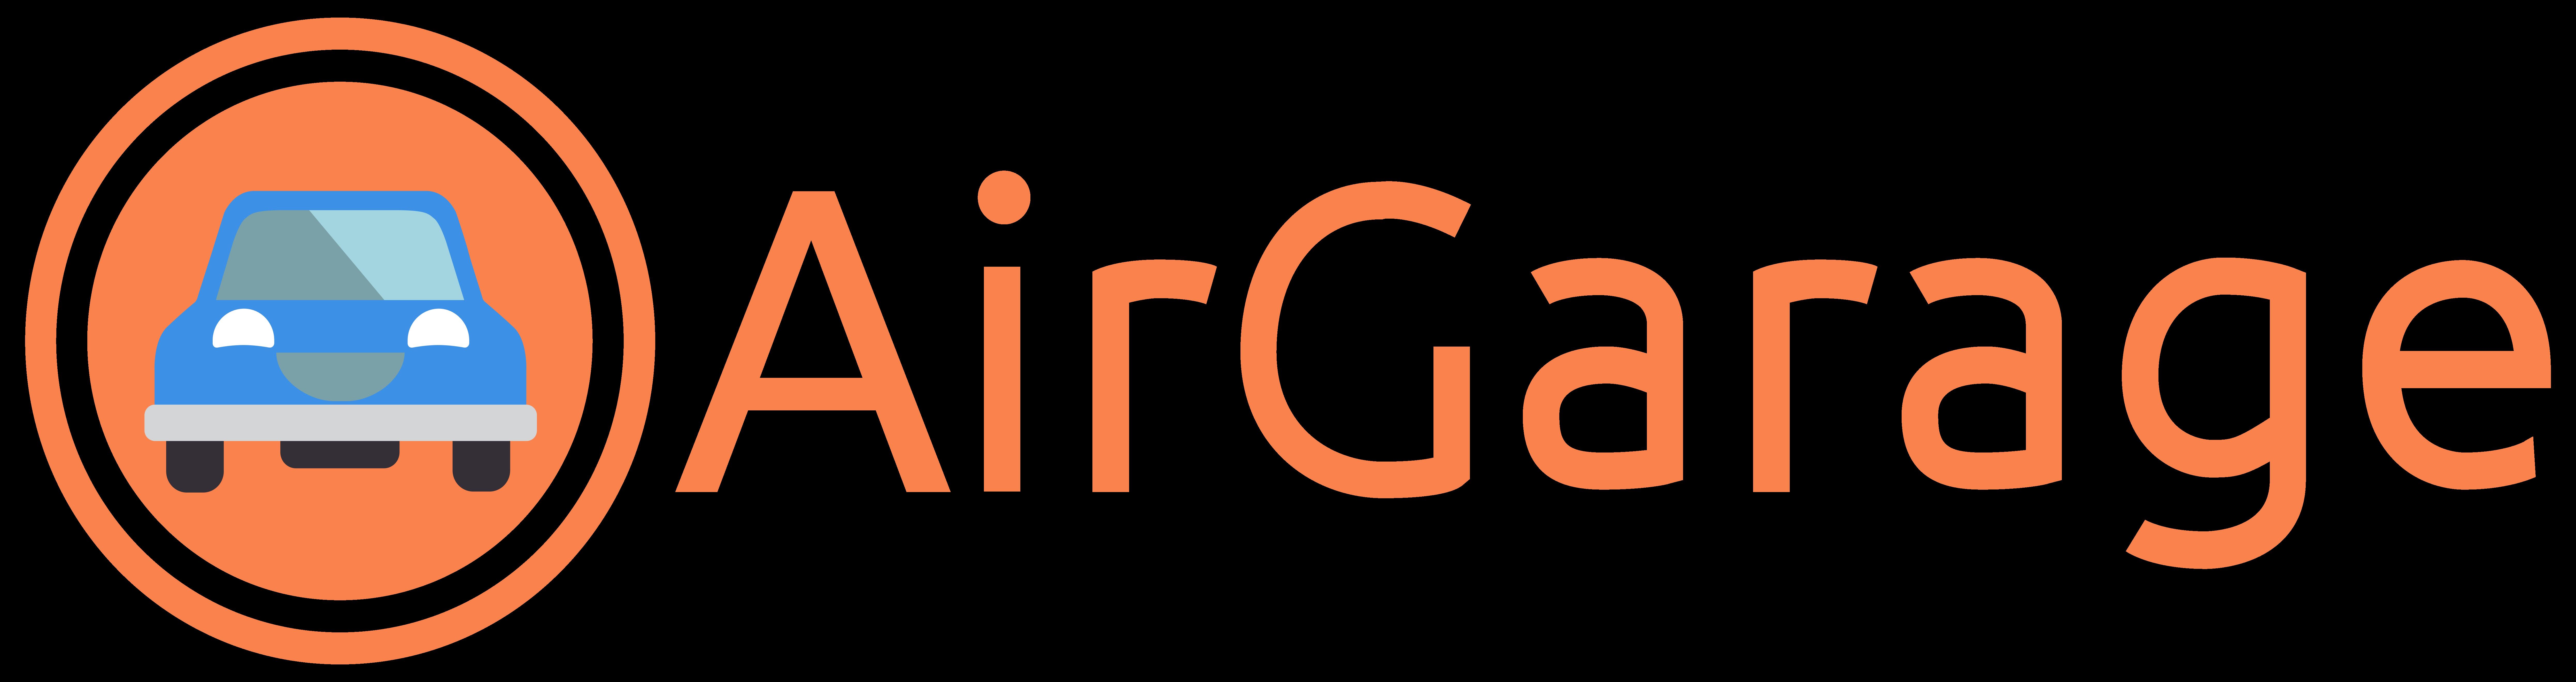 AirGarage logo